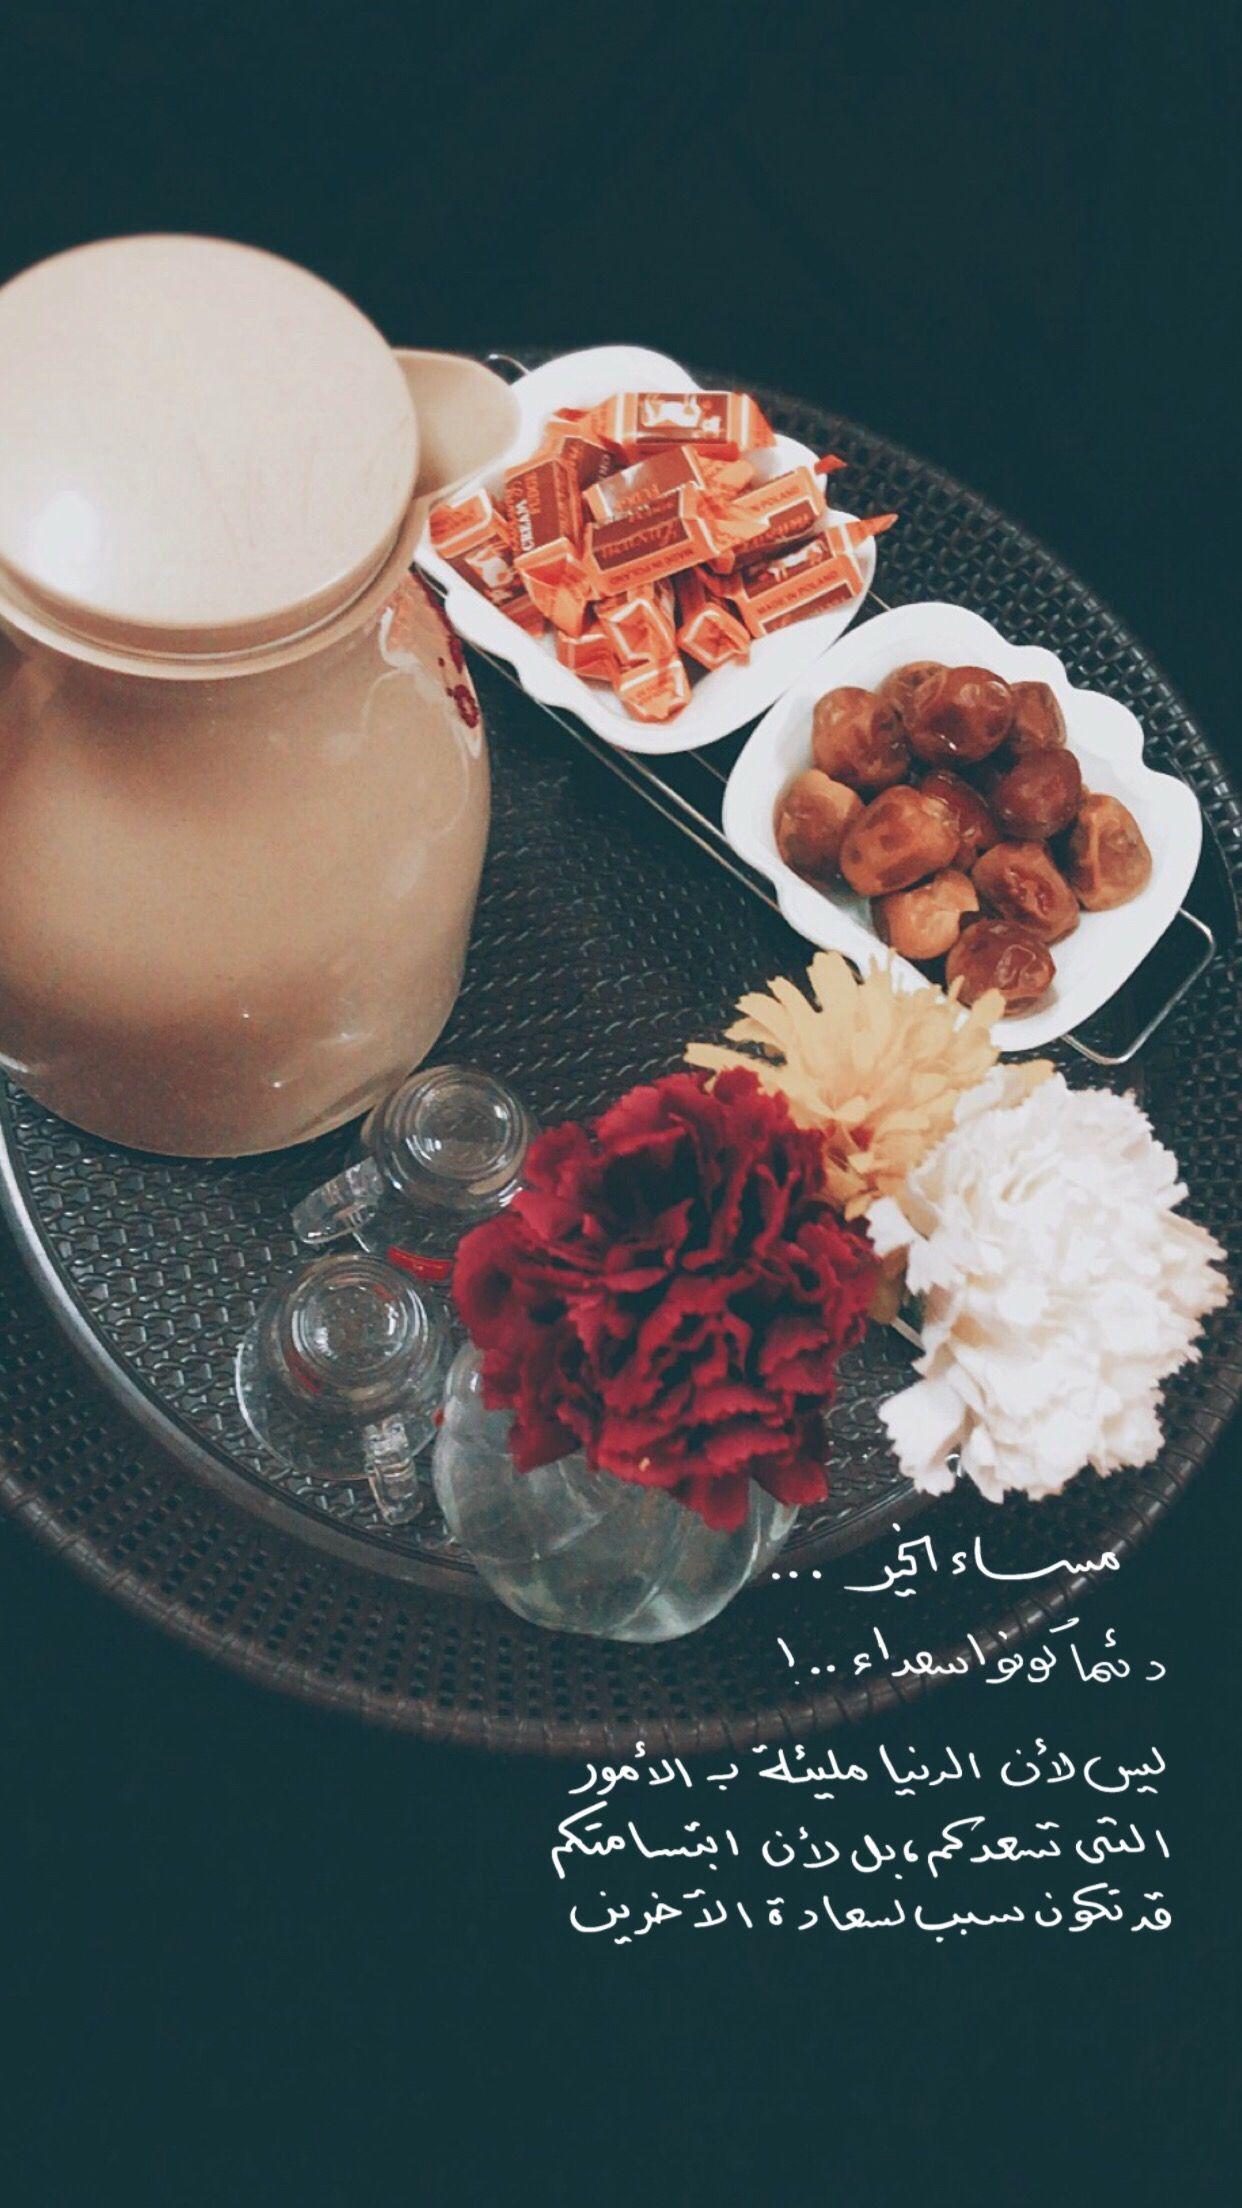 تصويري Sweet Breakfast Arabic Love Quotes Beautiful Arabic Words